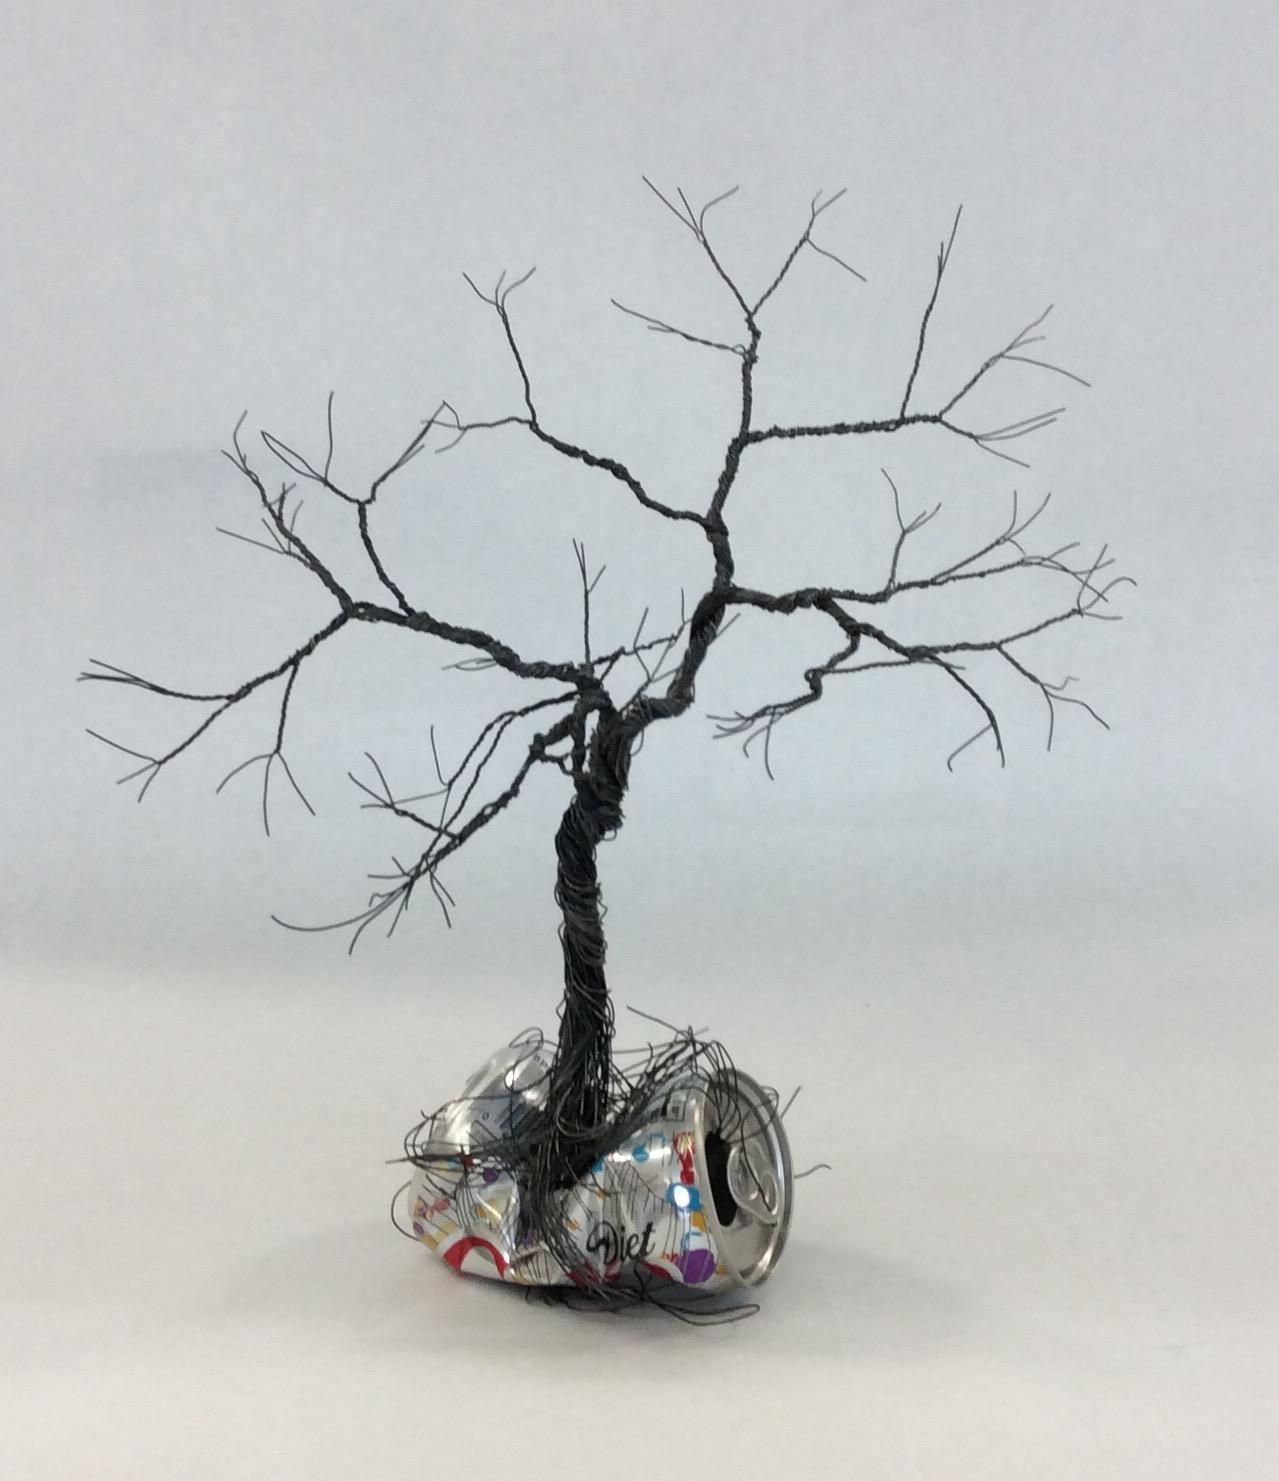 Wire Sculpture Art Field Trip Photos – Pentucket Profile